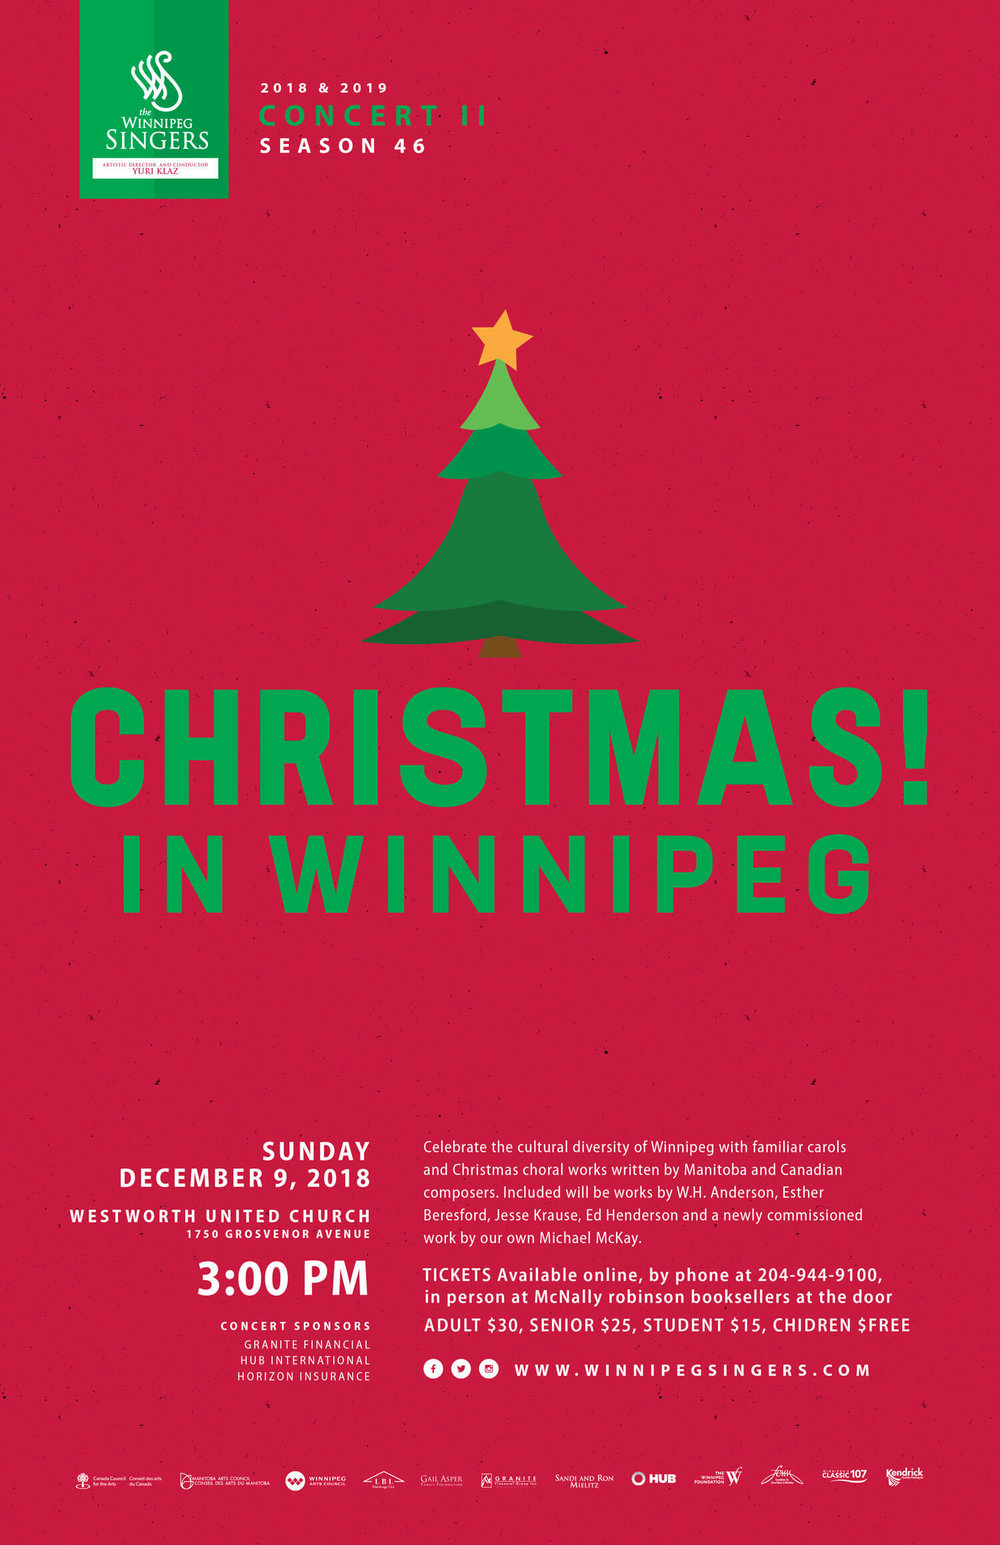 Winnipeg Singers - Christmas! in Winnipeg Concert